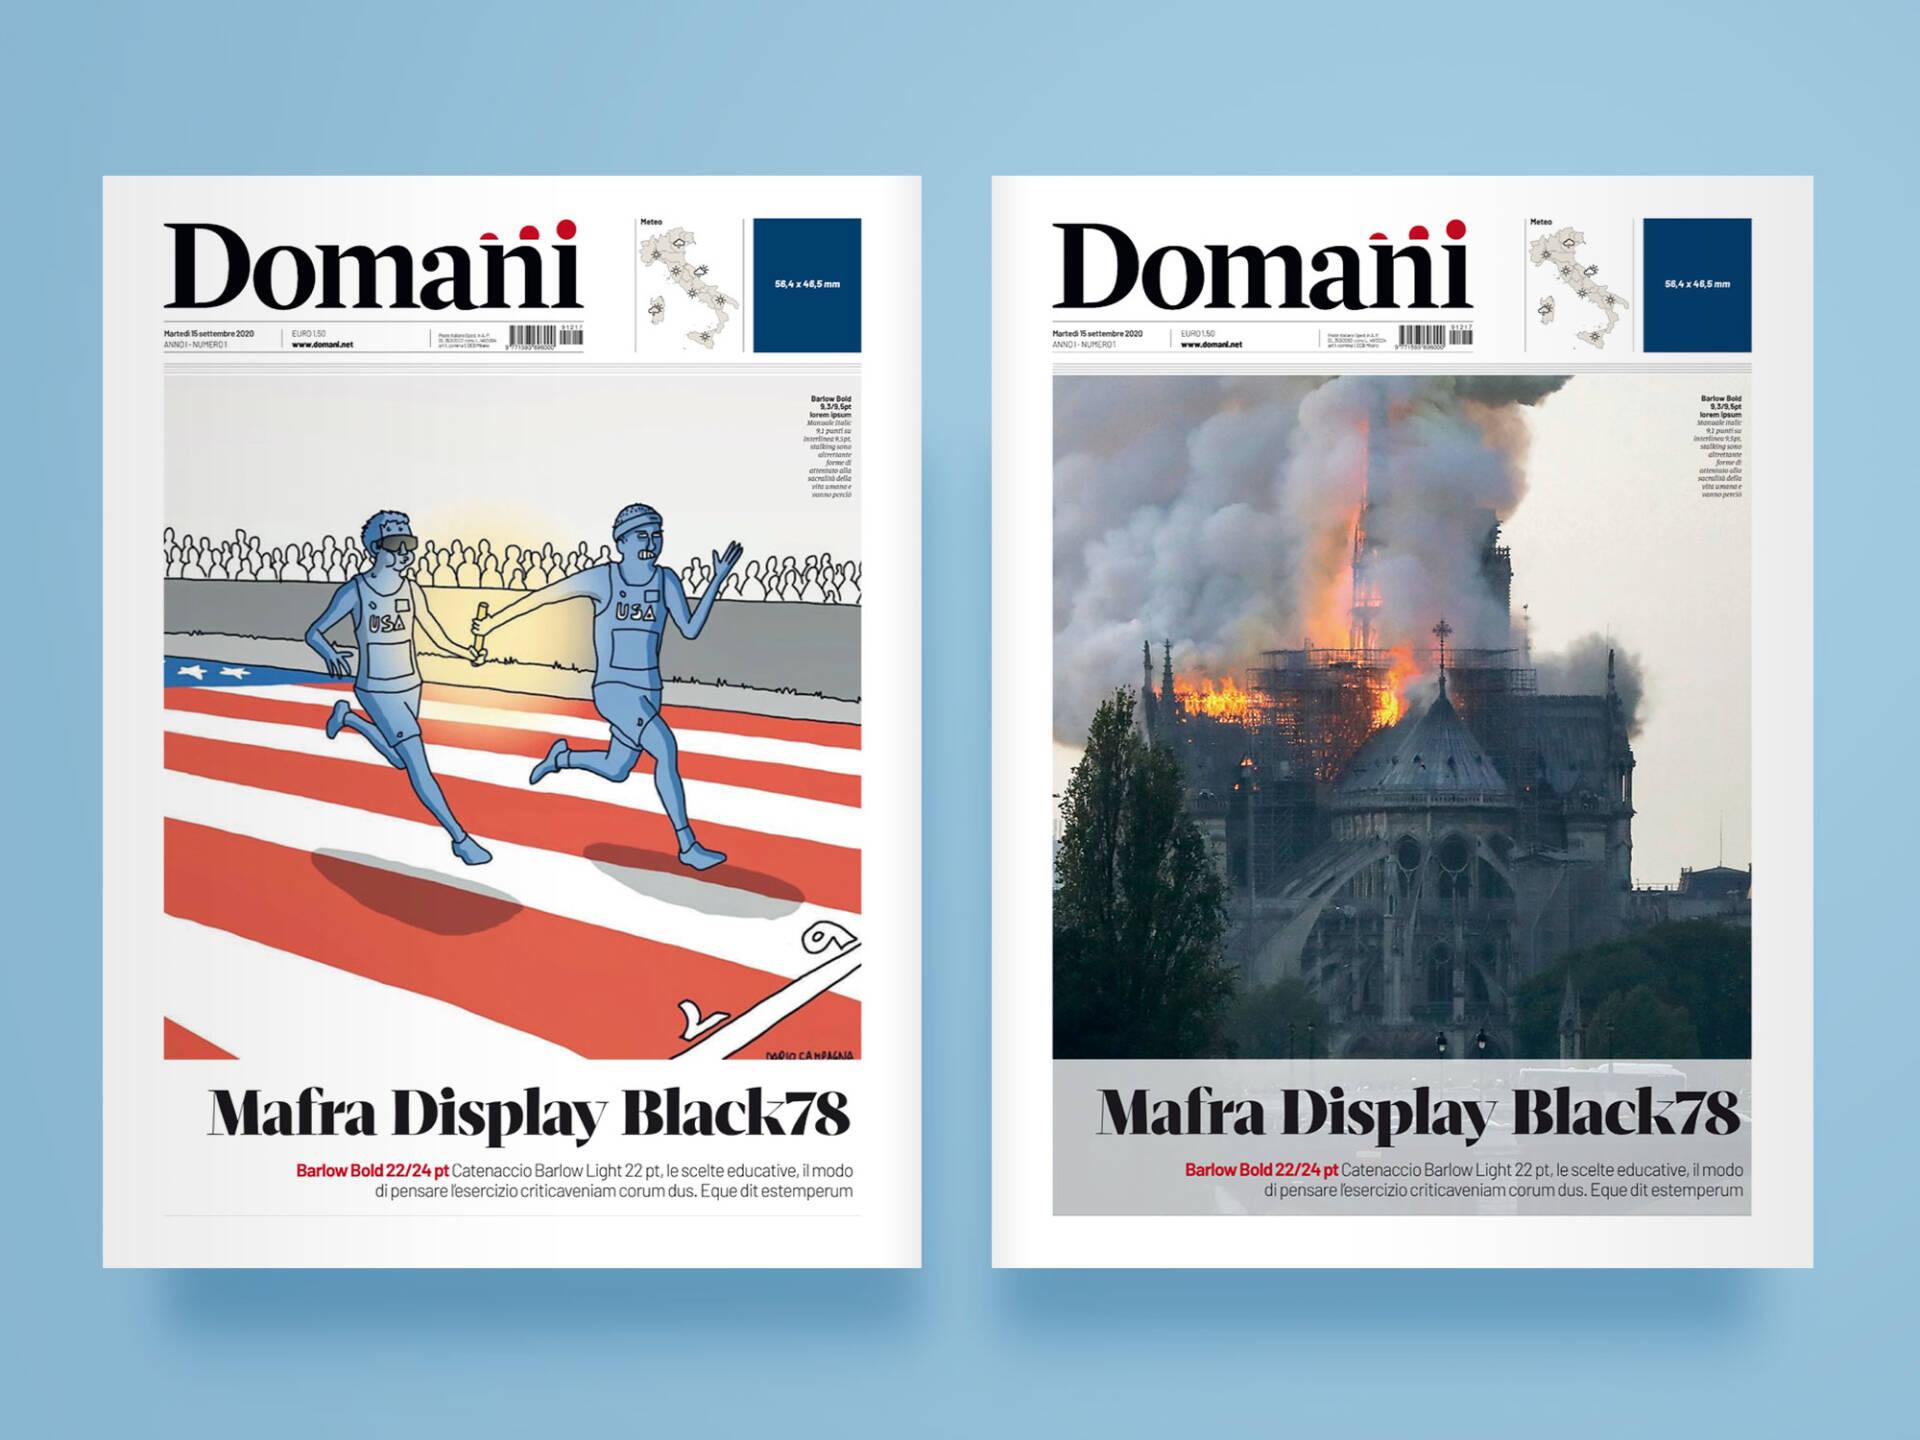 Domani_Print_Frontpage_Wenceslau_News_Design04